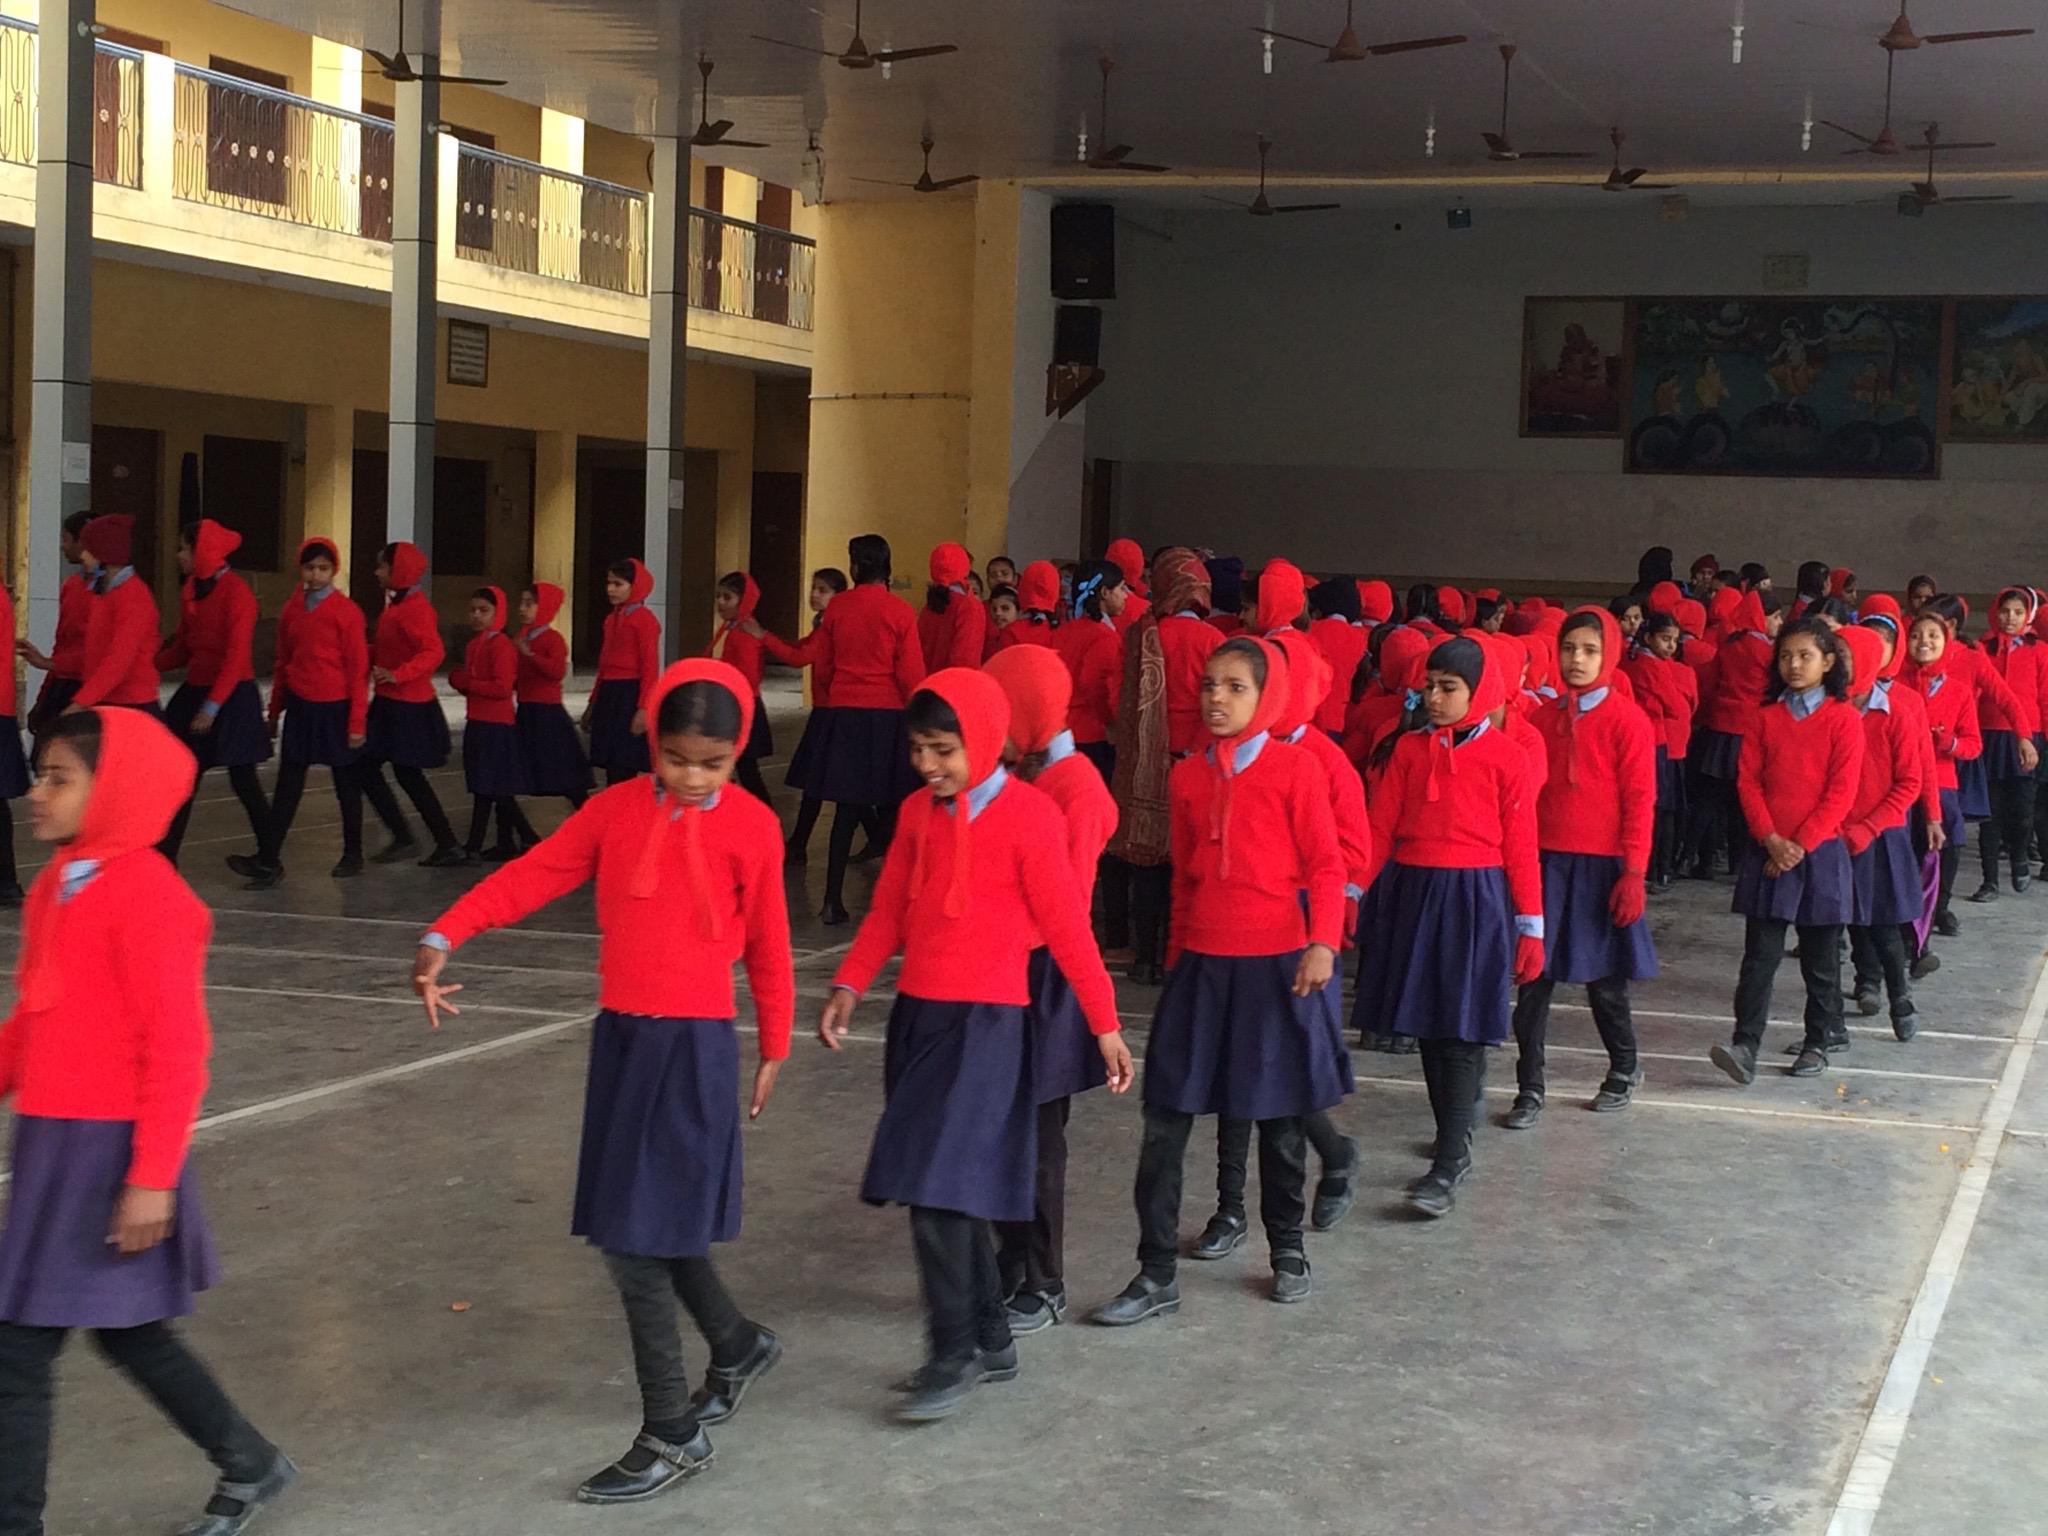 sandipani-muni-school-girls-education-india-made-with-a-purpose.jpg